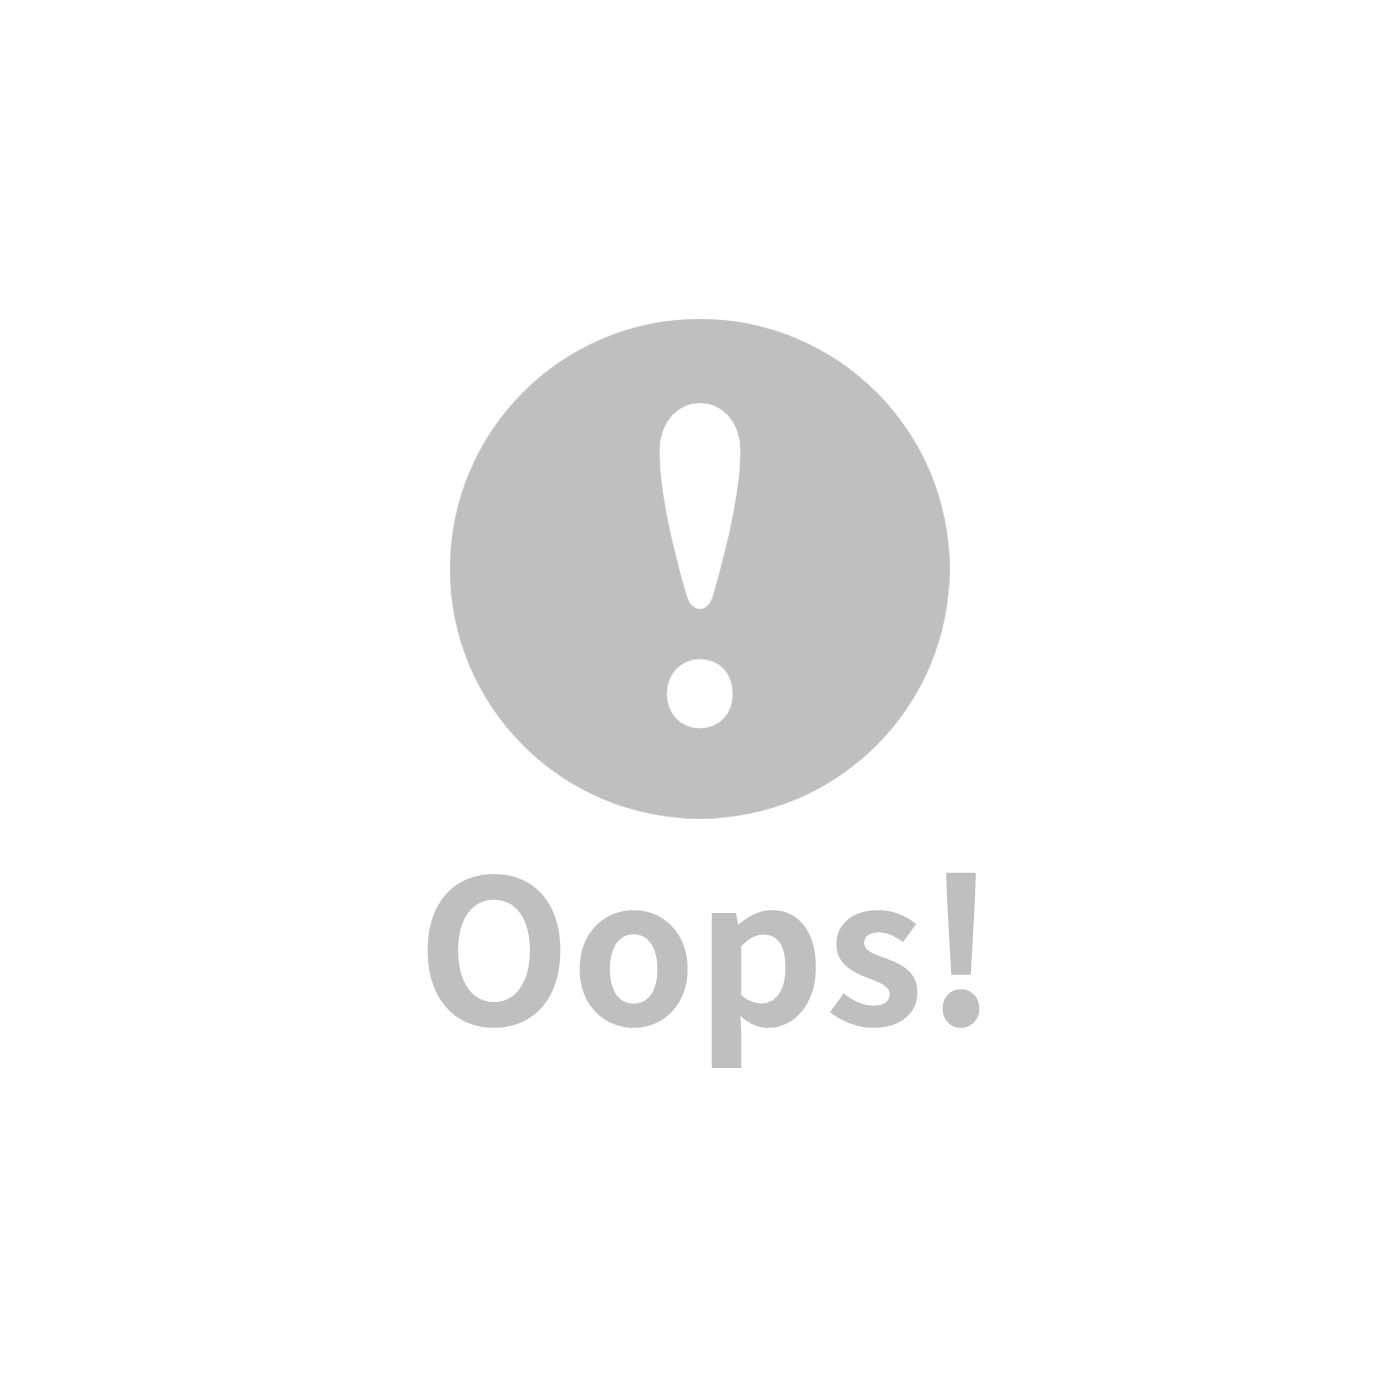 global affairs 童話手工編織安撫搖鈴_飛機系列(天空藍)